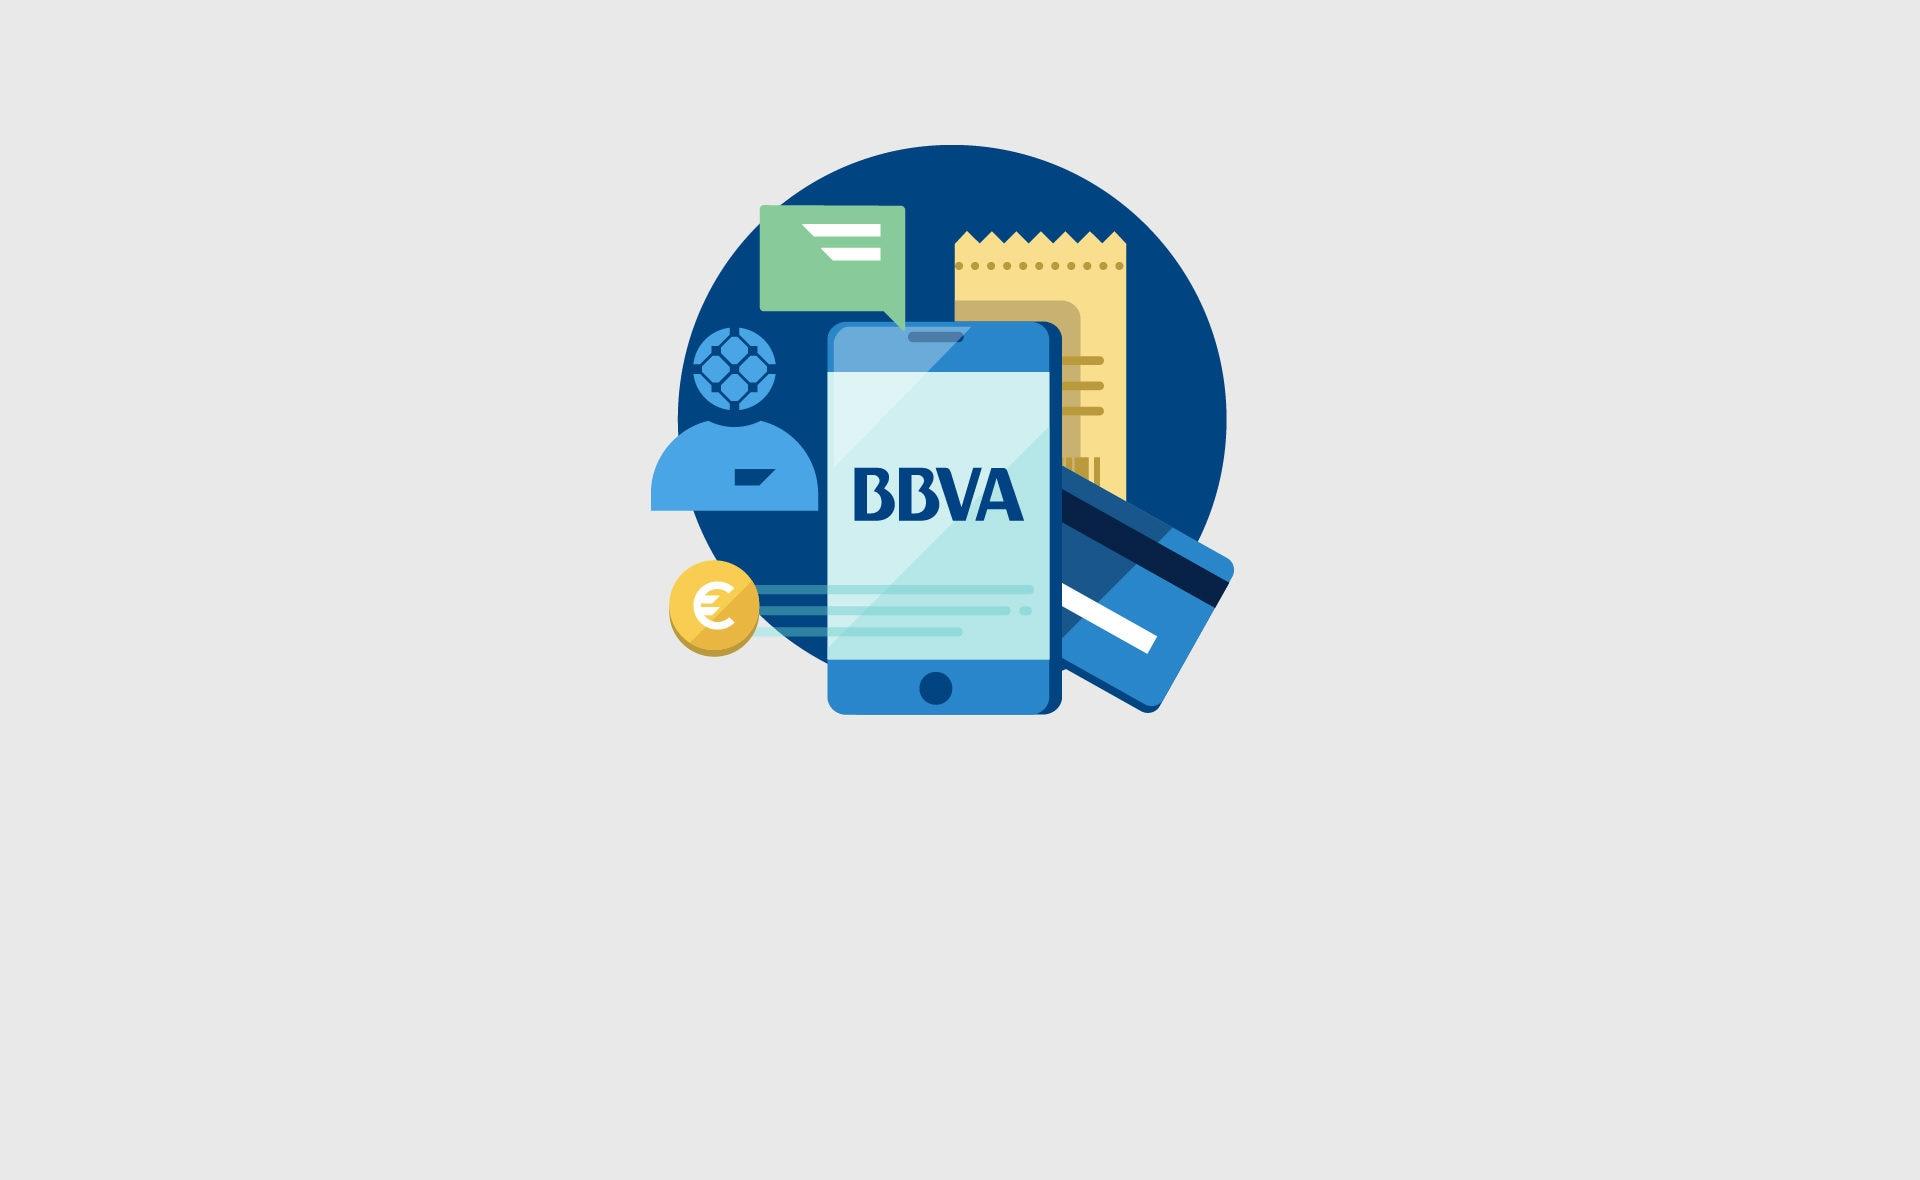 BBVA-y-iphone